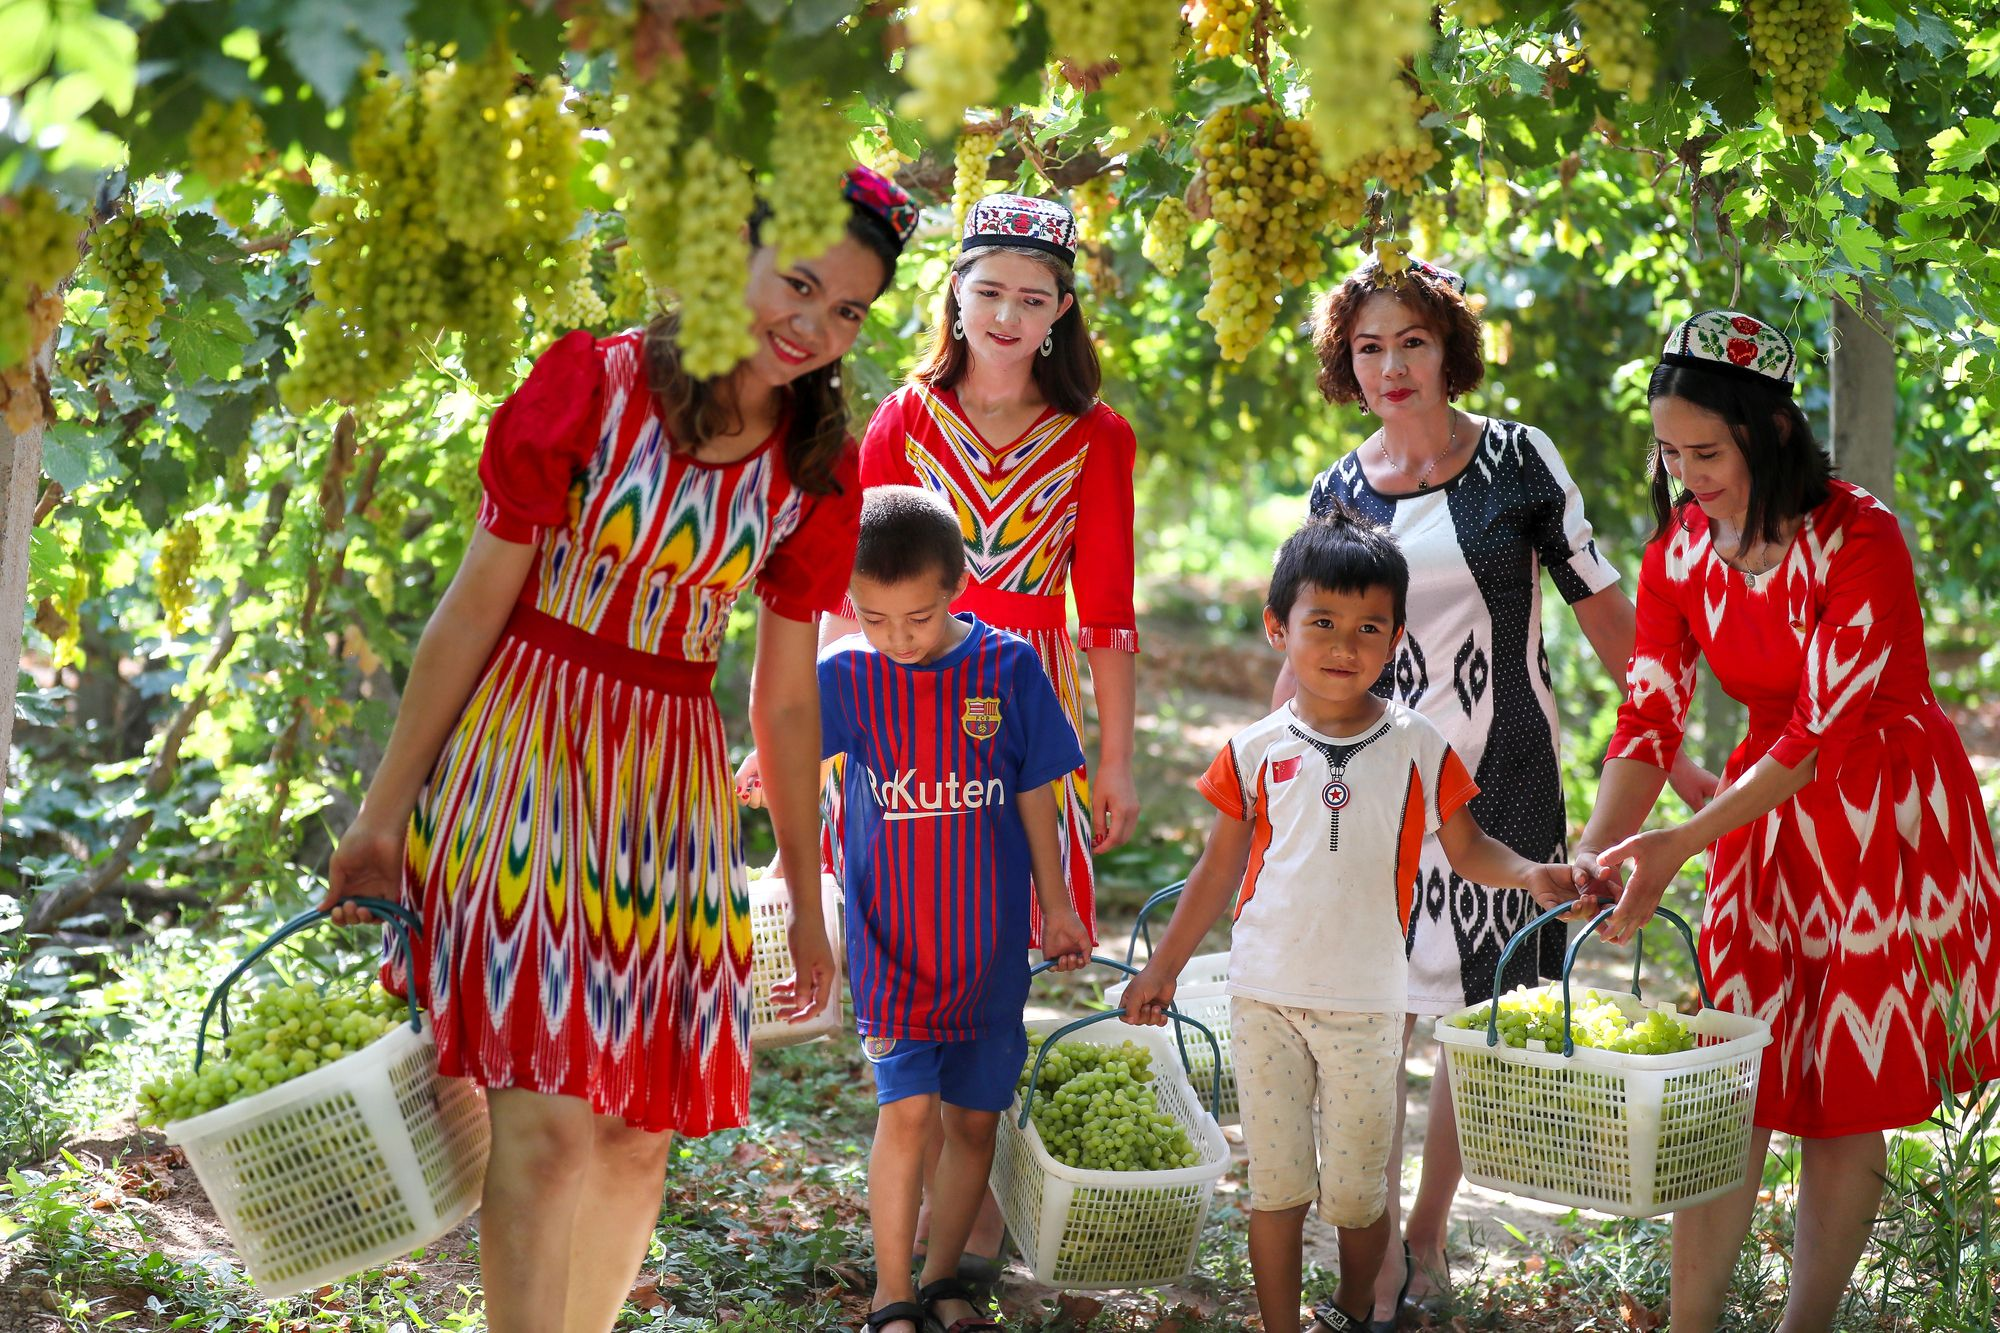 Uyghur Family Harvesting Grapes